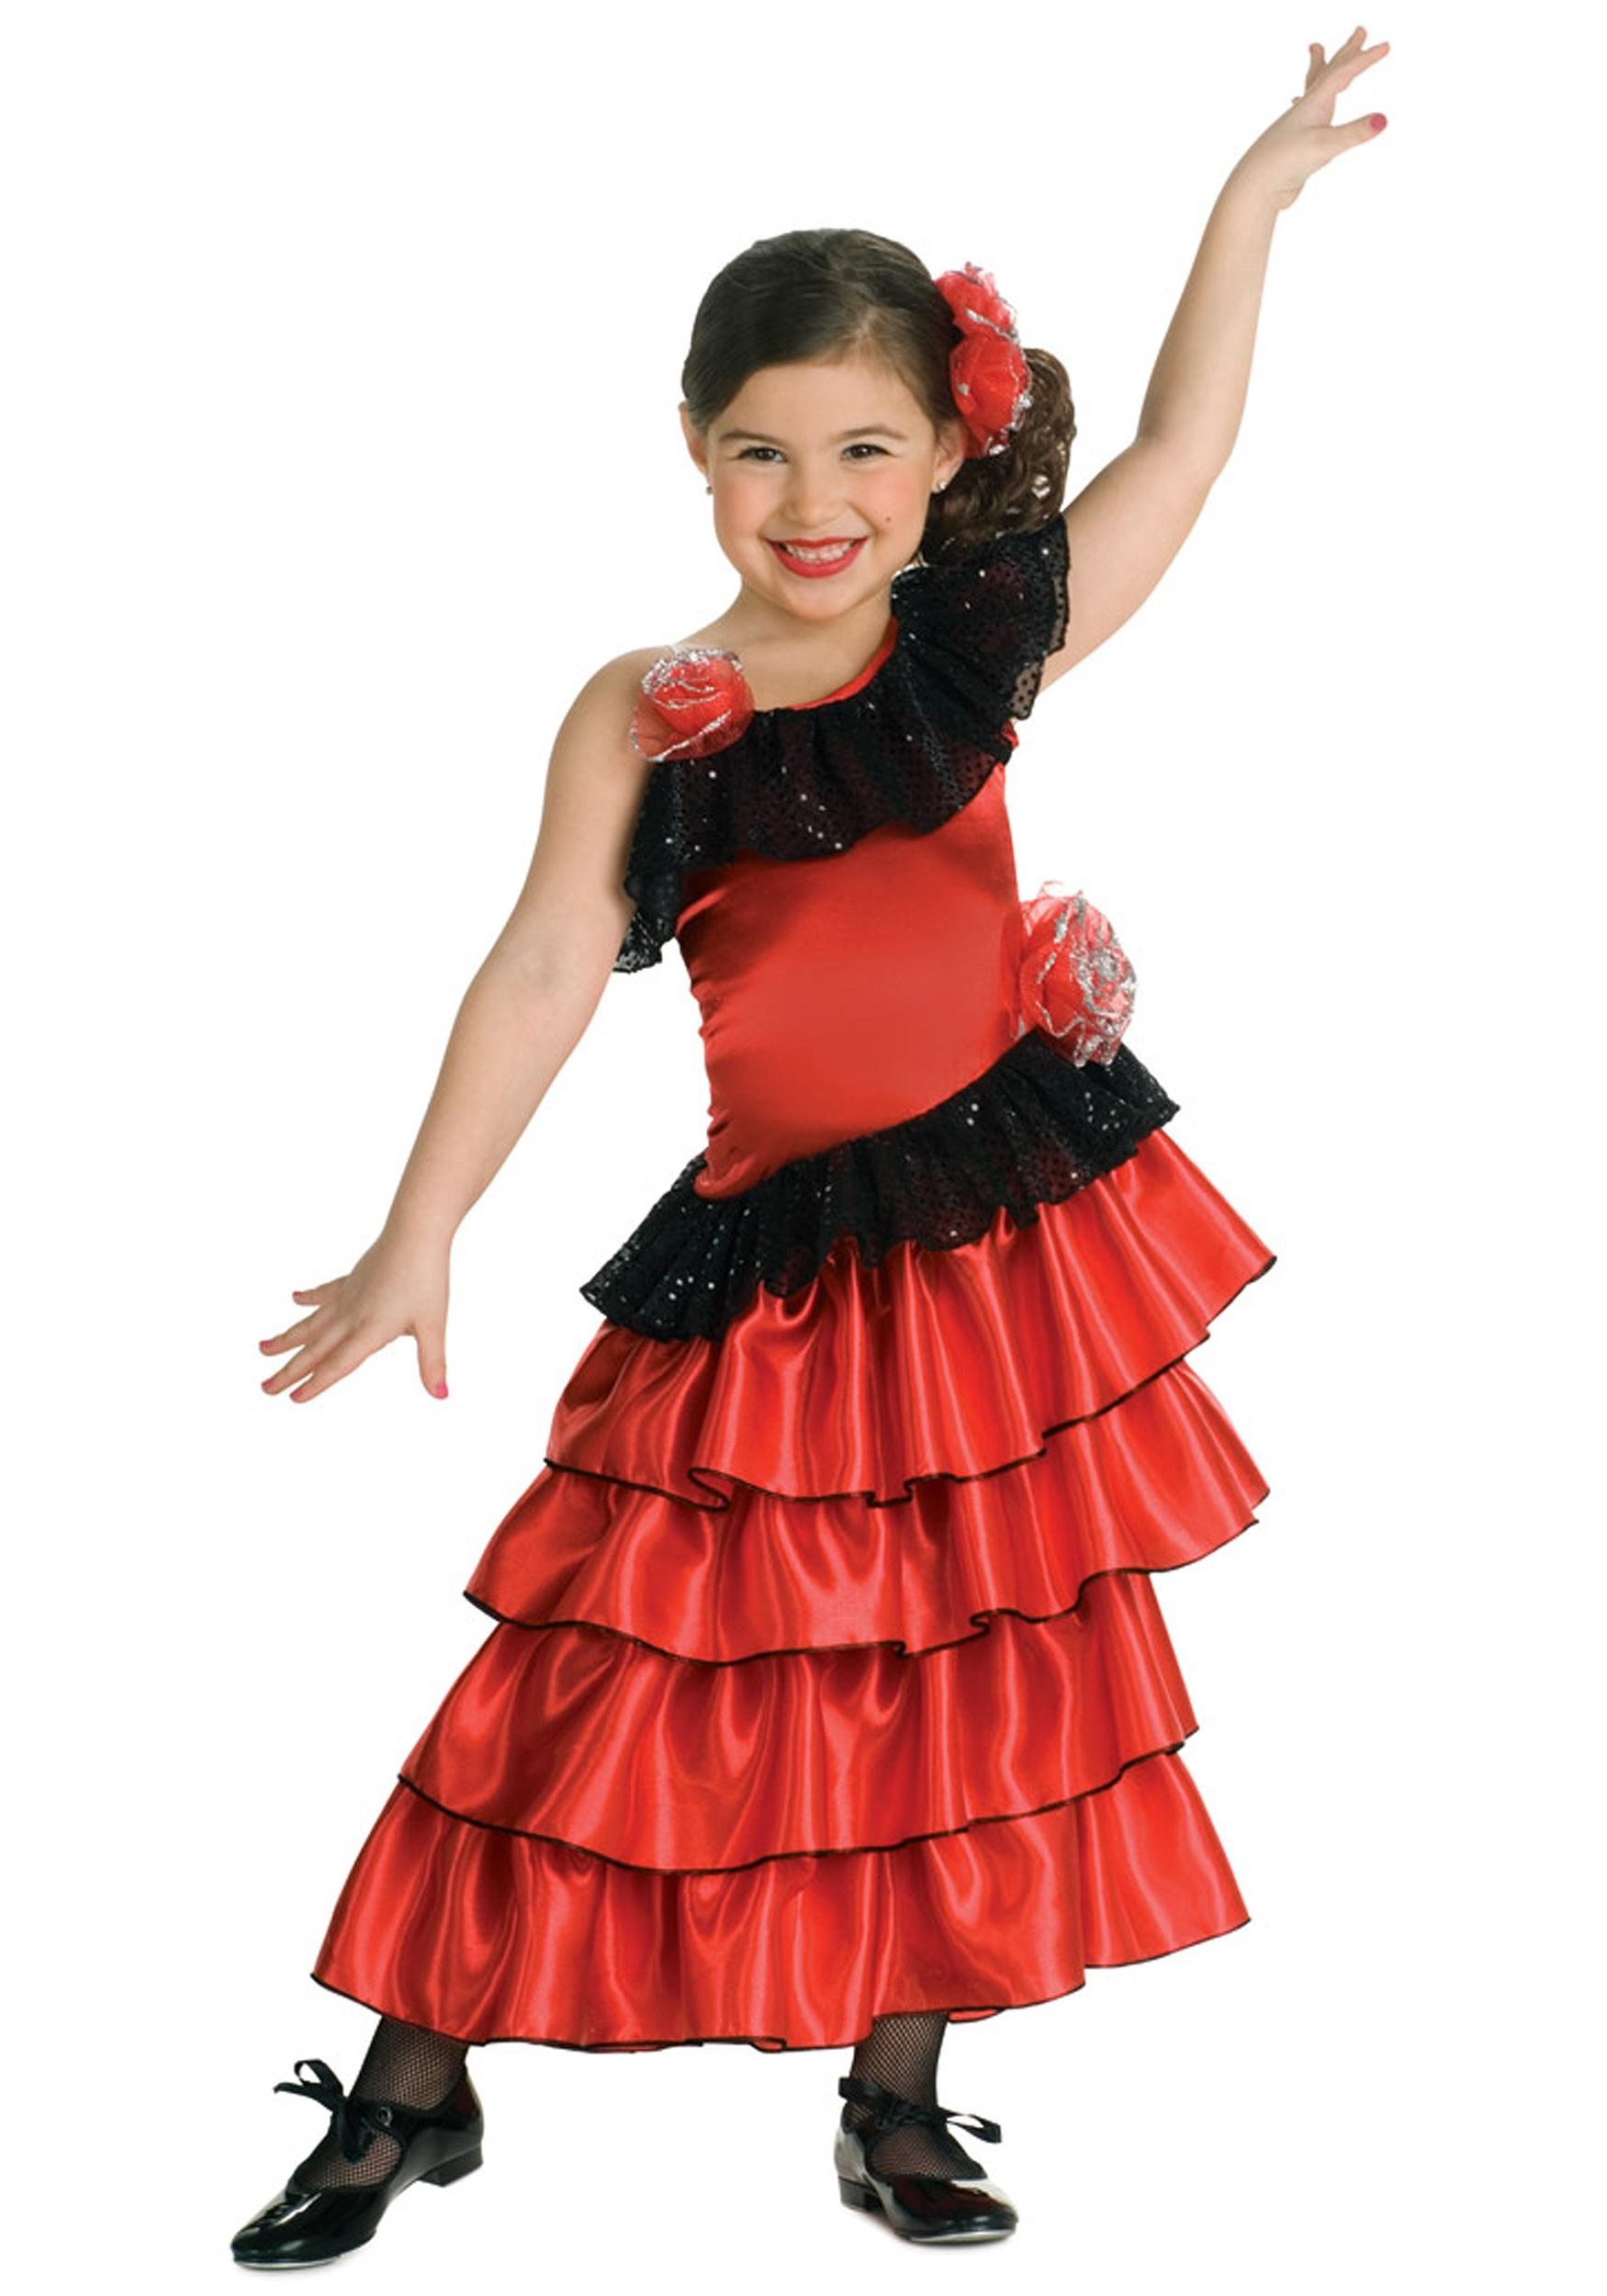 c977afbb4 Girls Spanish Flamenco Dancer Costume